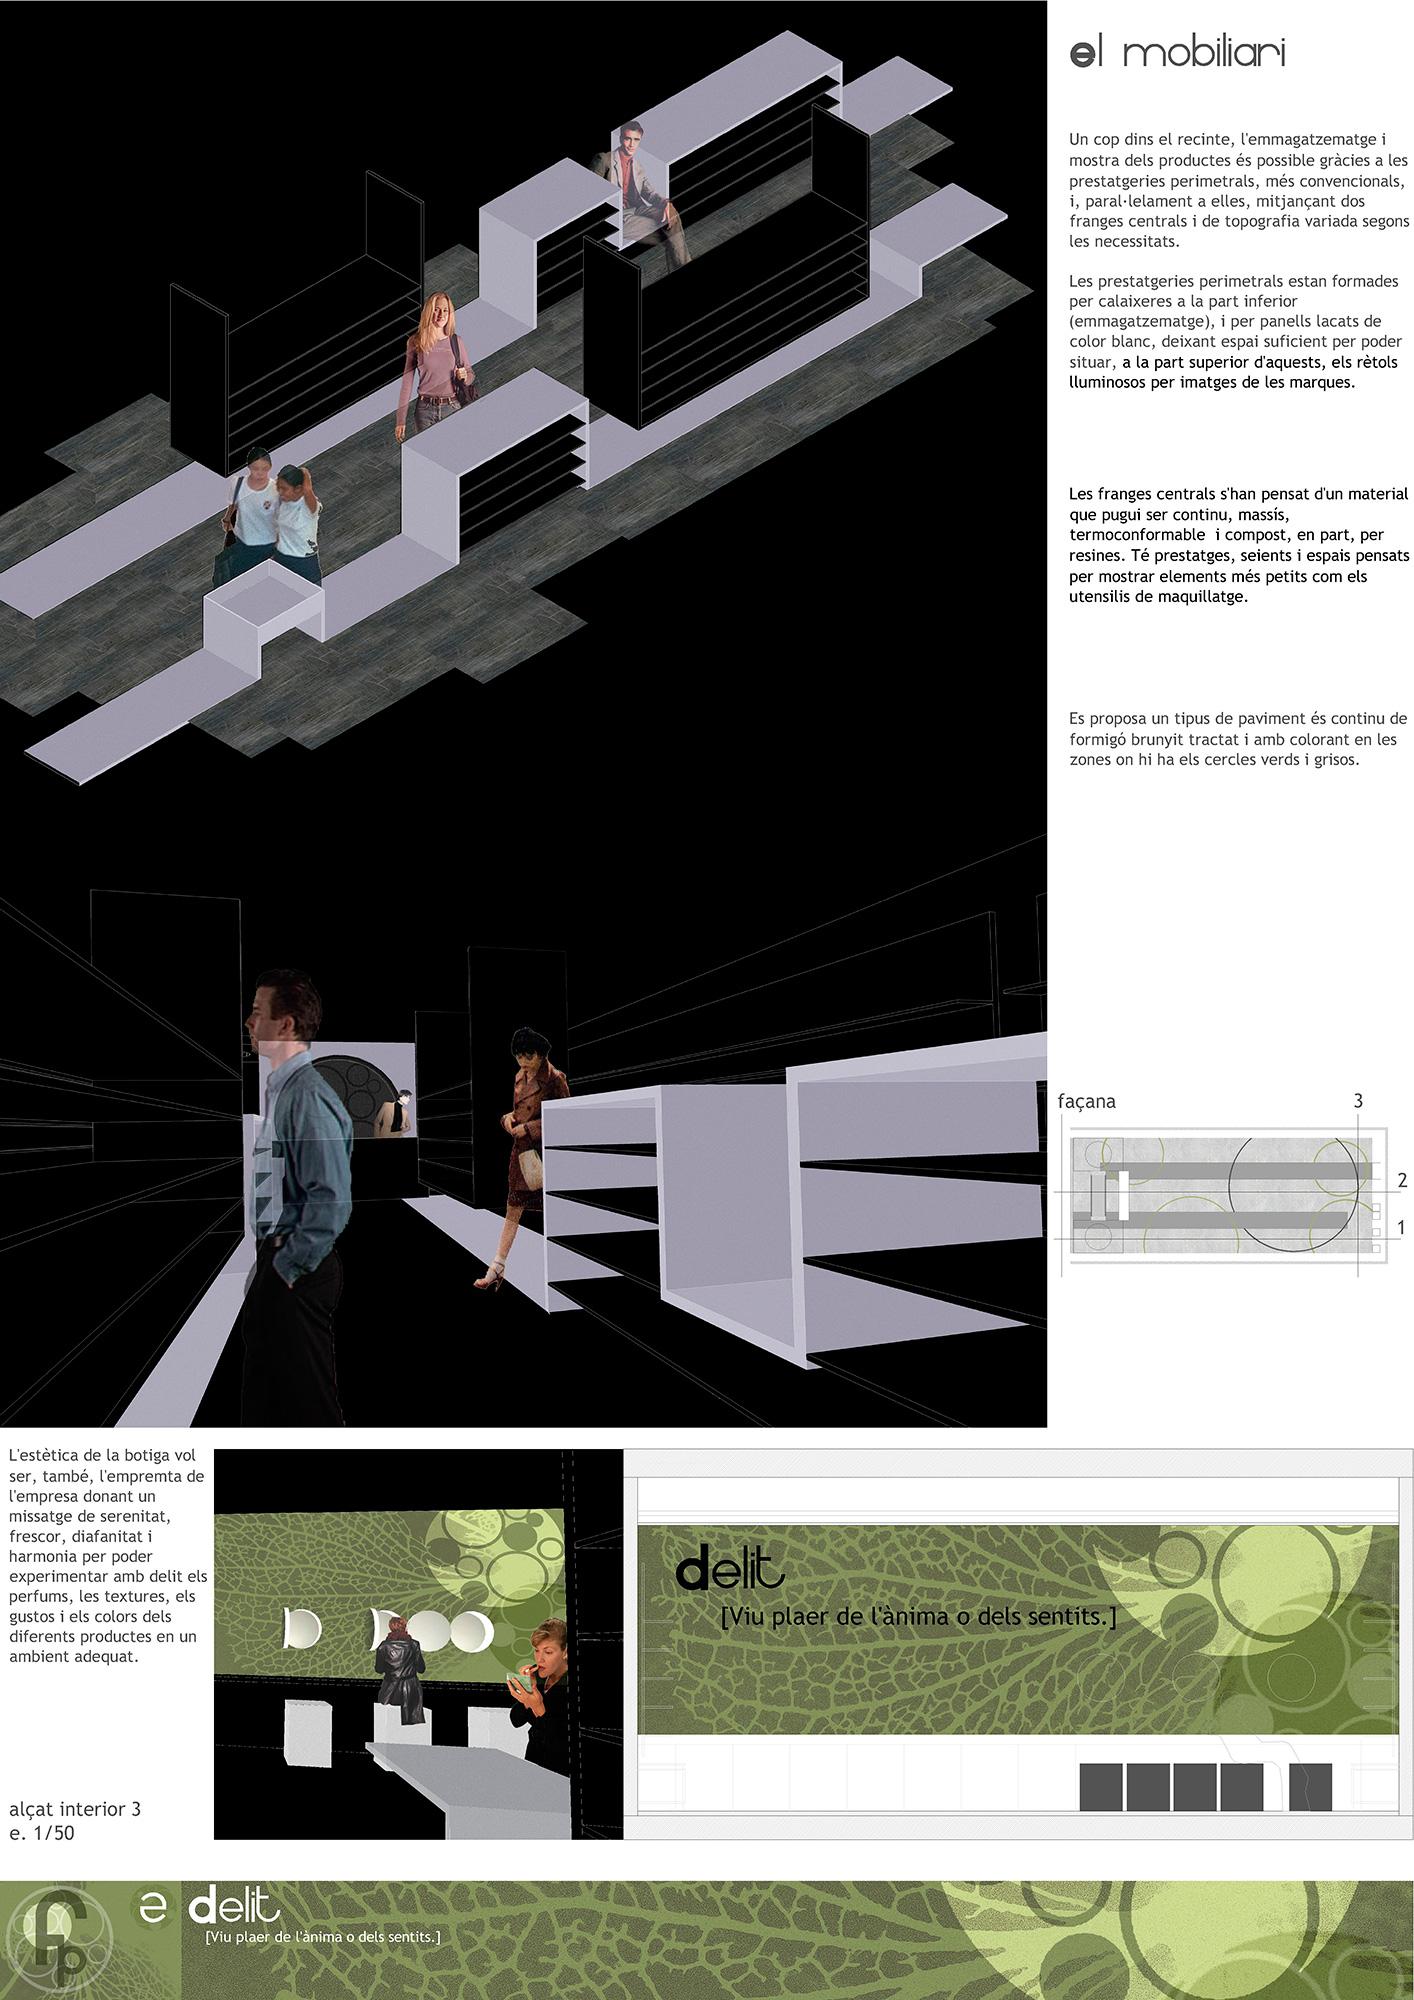 http://www.oa-arquitectes.com/wp-content/uploads/2018/05/06-1.jpg